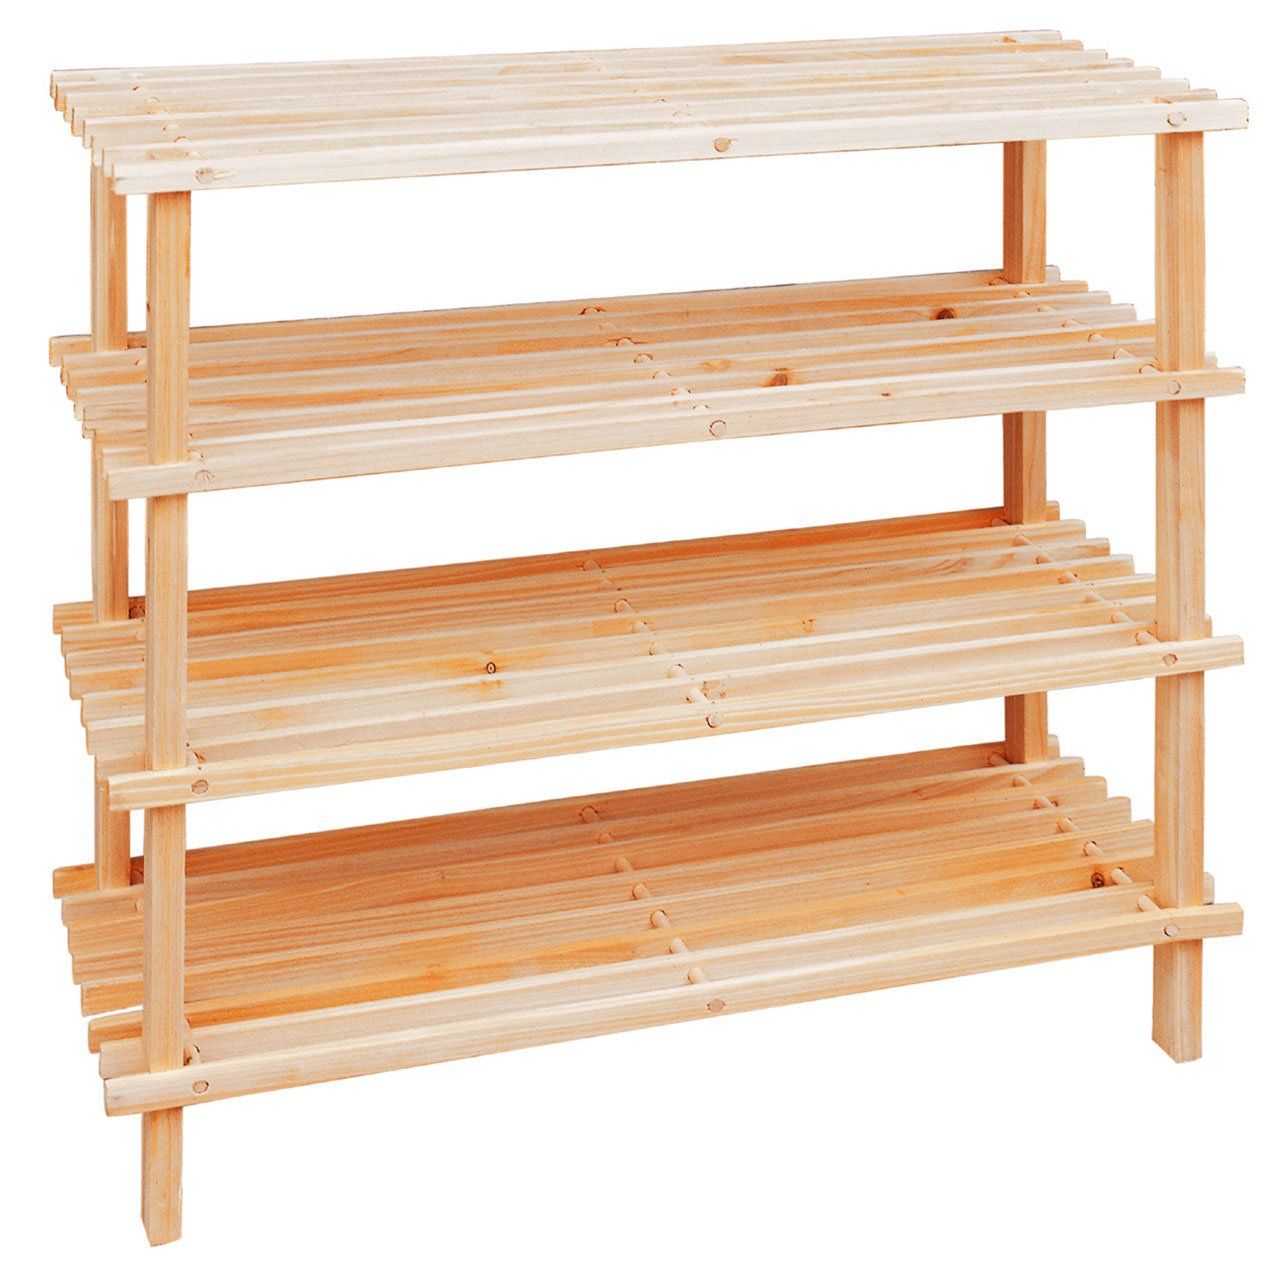 shoe organizer furniture. PINE WOOD 4 TIER STORAGE WOODEN SHELF SHOE RACK: Amazon.co.uk: Kitchen \u0026 Home Shoe Organizer Furniture R